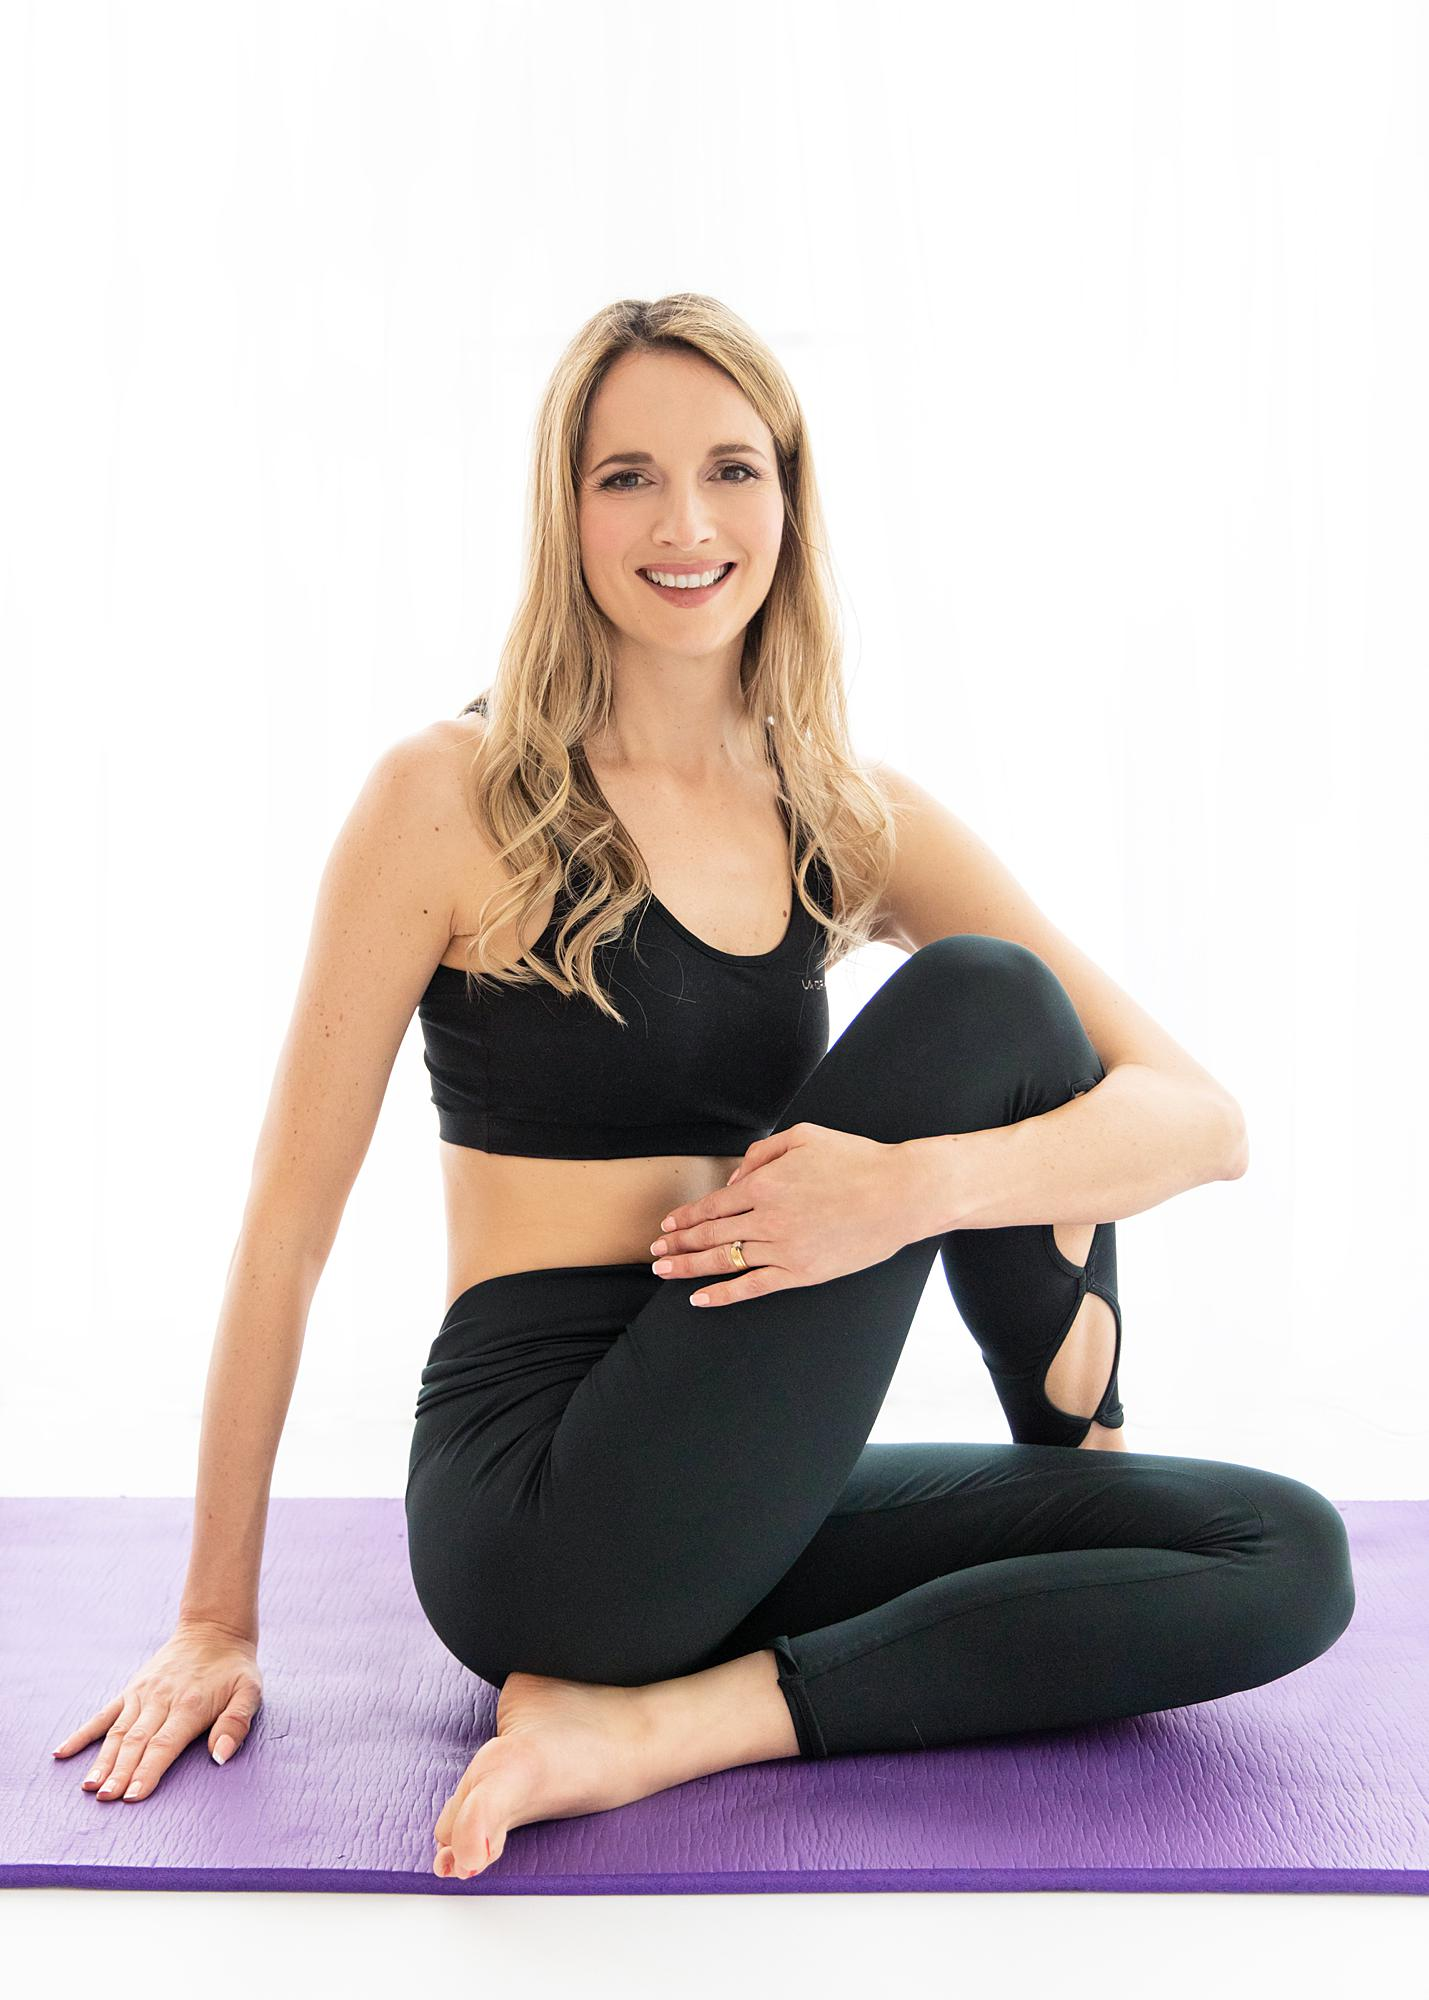 Pilates teacher poses during her Personal Branding Photo shoot in Suffolk Studio